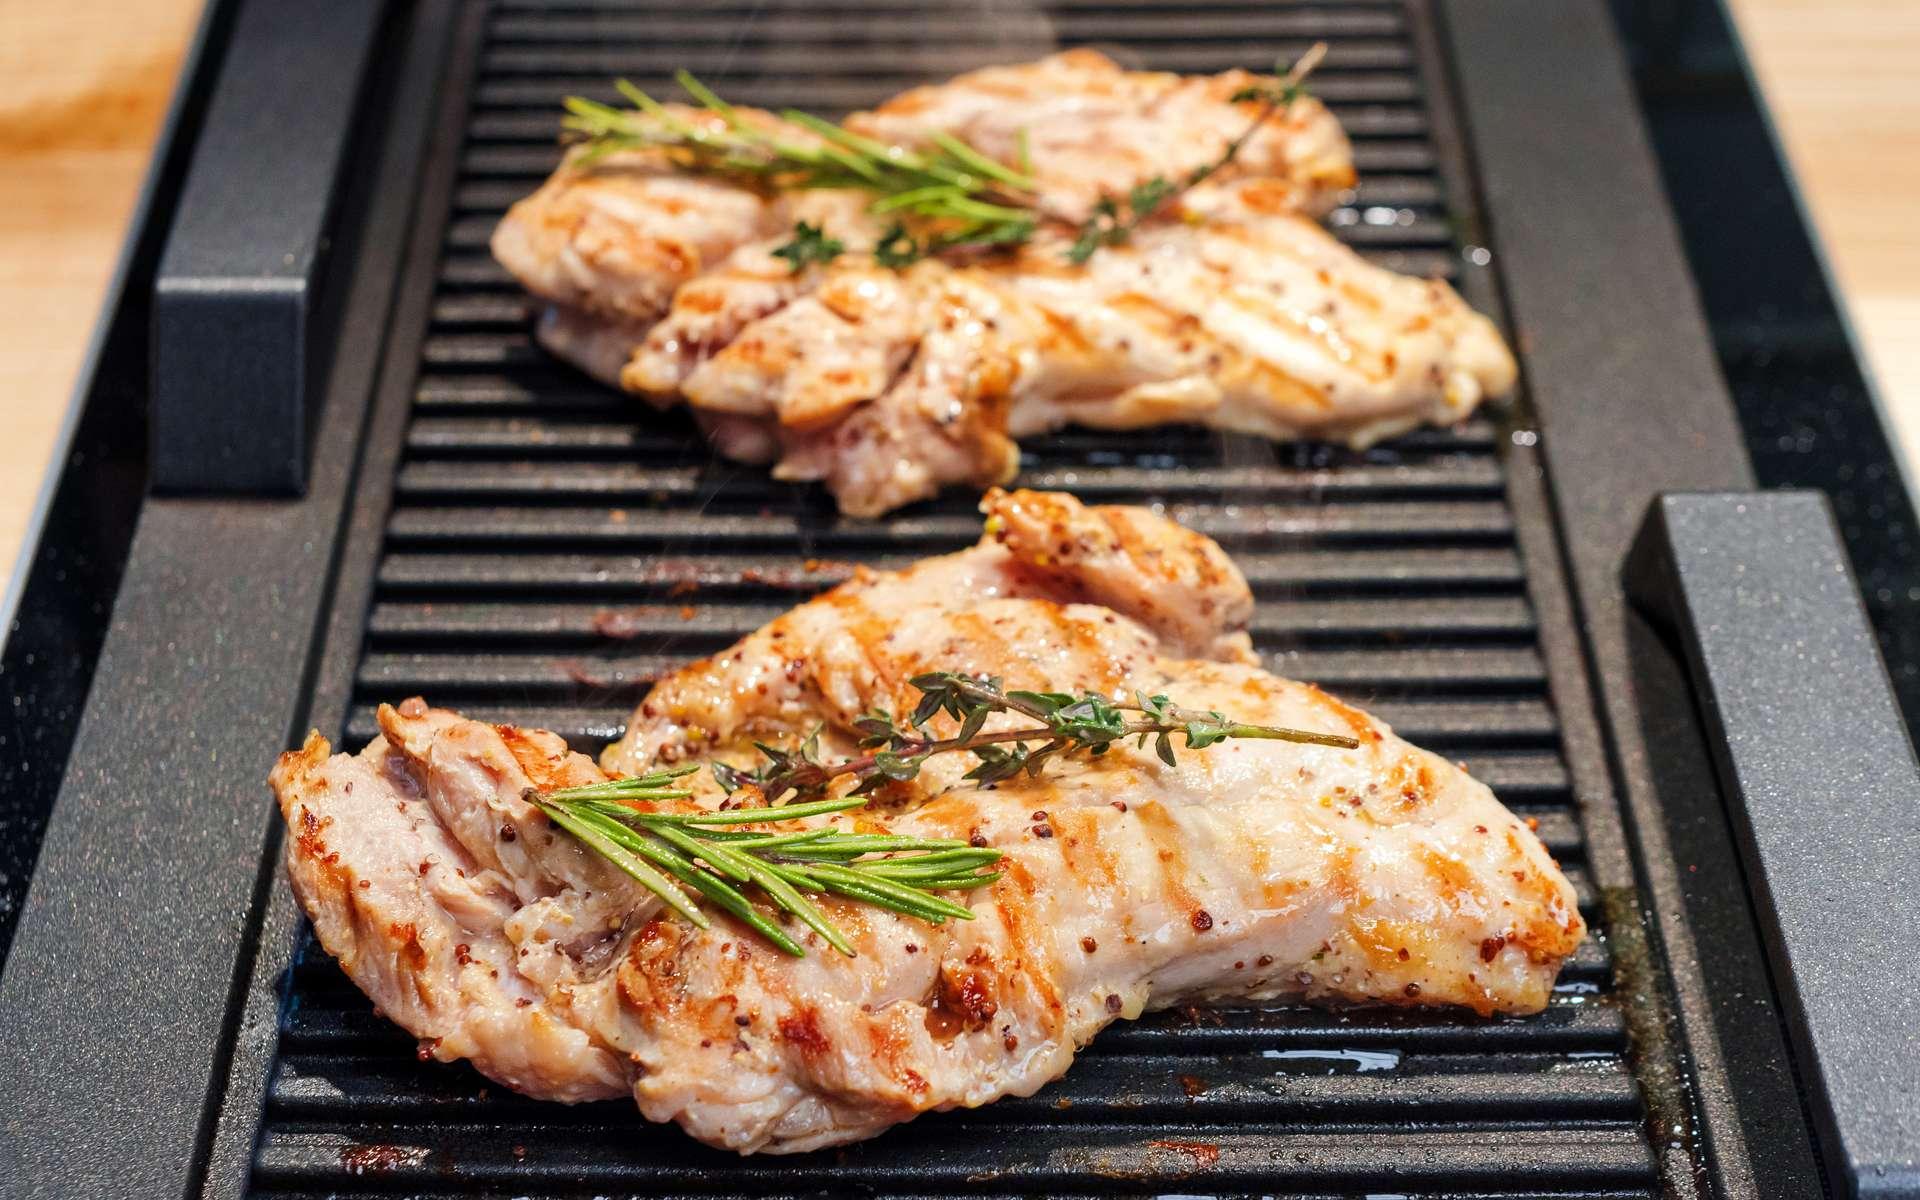 La viande cuite au laser, meilleure que la viande cuite au gril ? © Magryt, Adobe Stock